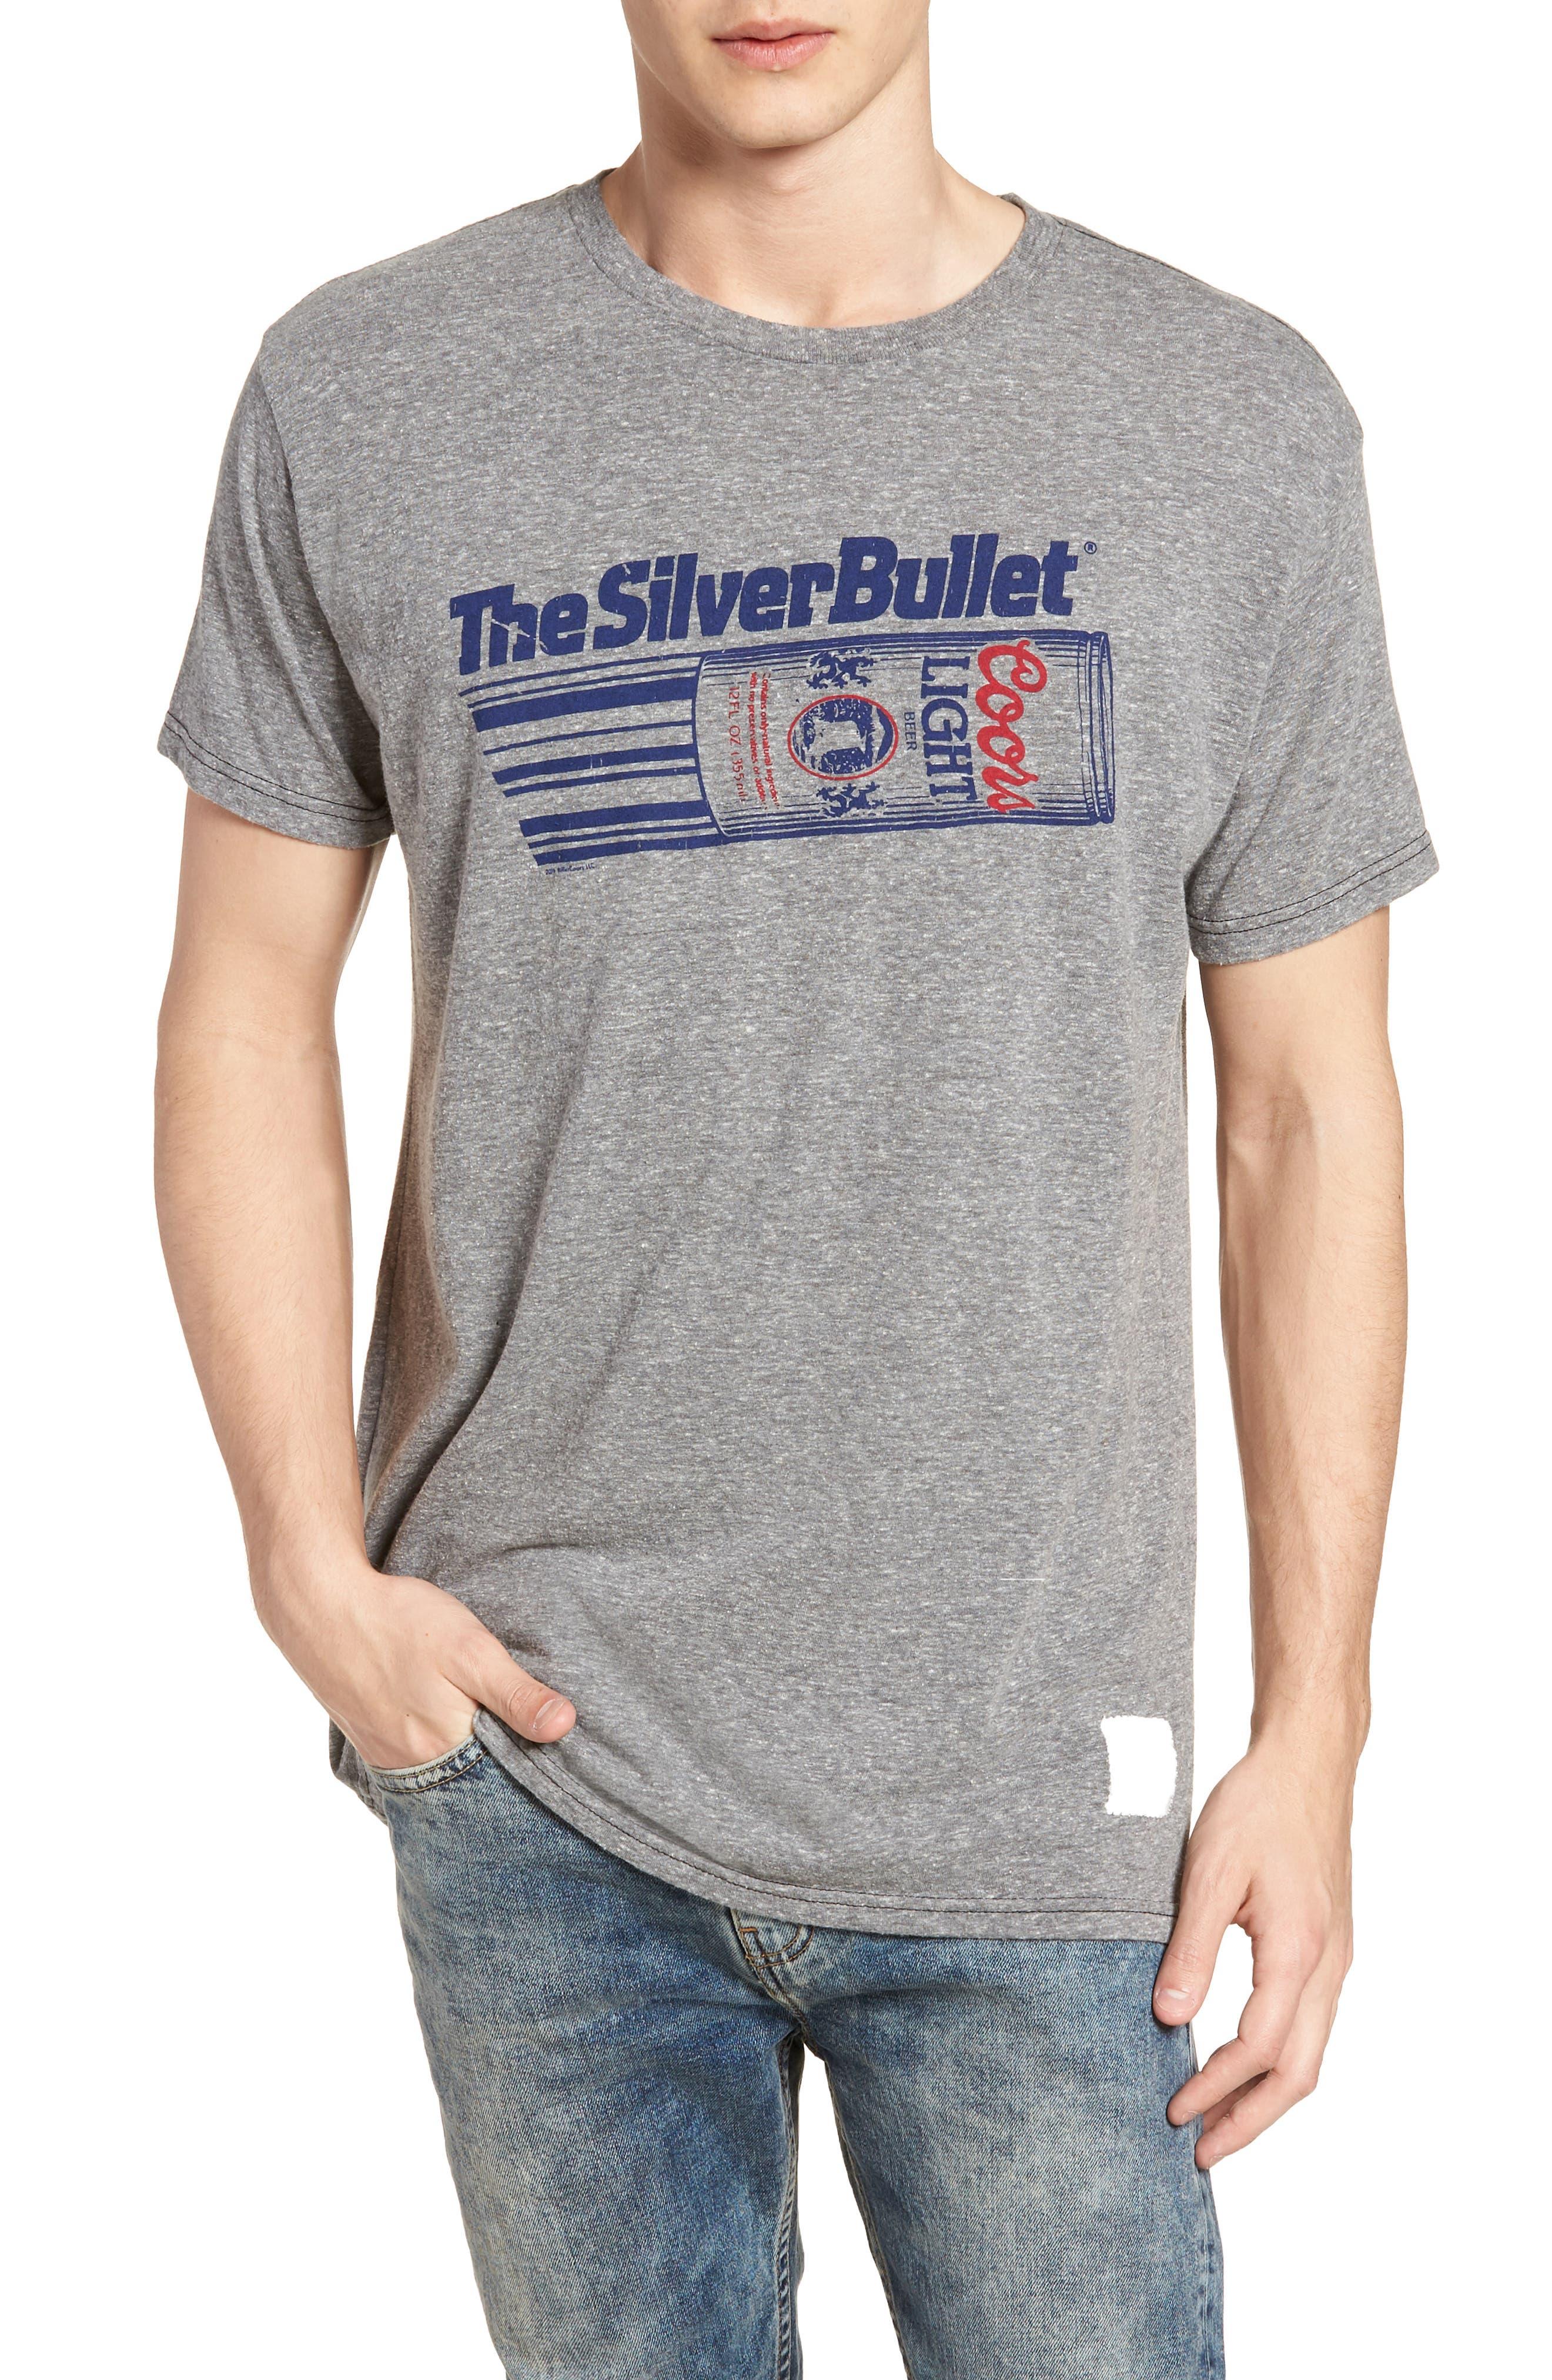 RETRO BRAND,                             Original Retro Brand Silver Bullet Graphic T-Shirt,                             Main thumbnail 1, color,                             020